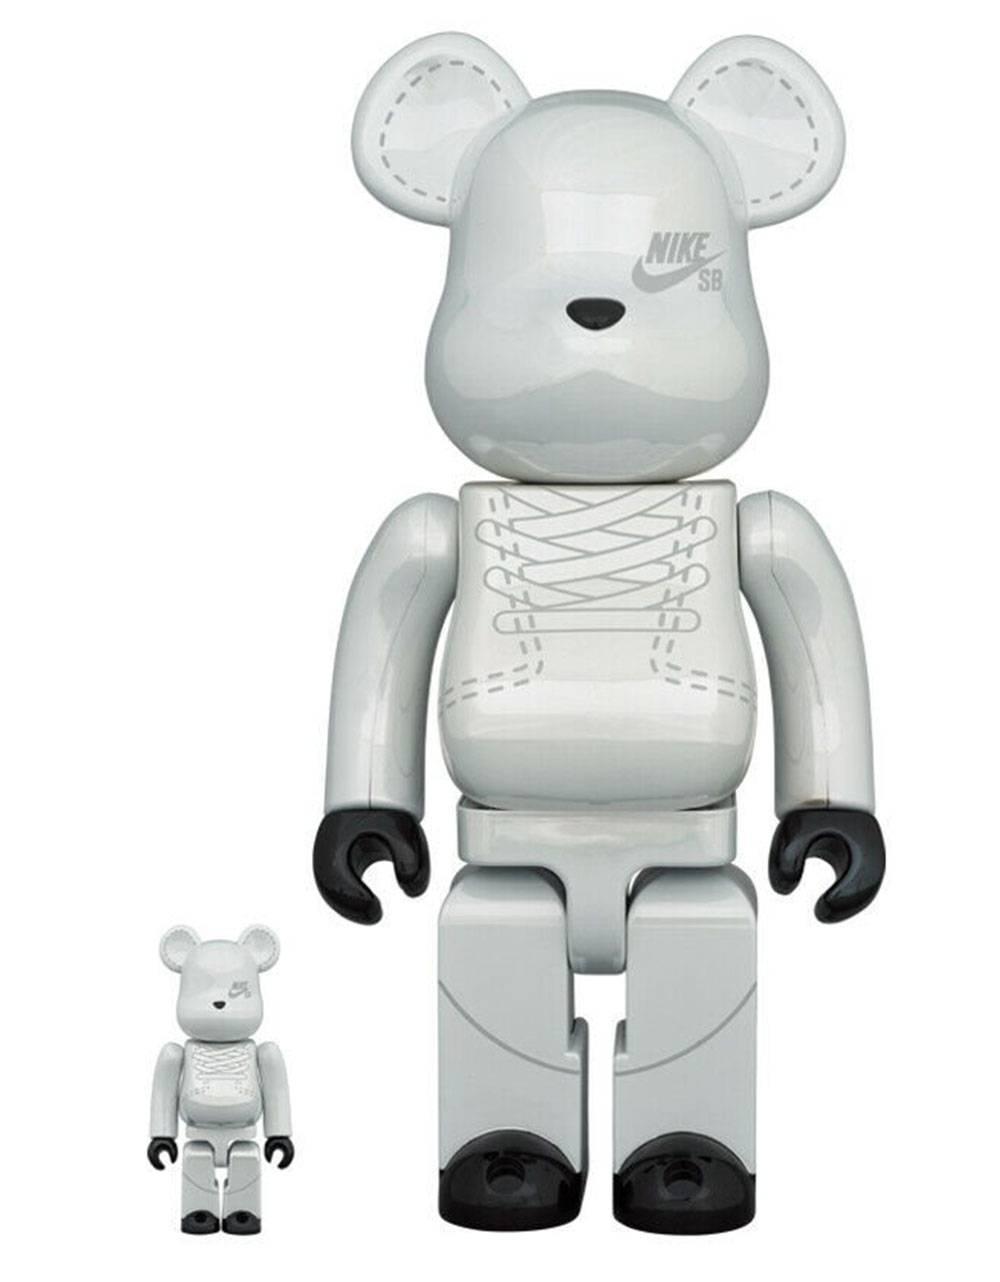 Medicom Toy Nike SB Bearbrick Set 100% 400% - Platinum White Medicom Toy Toys 204,92€